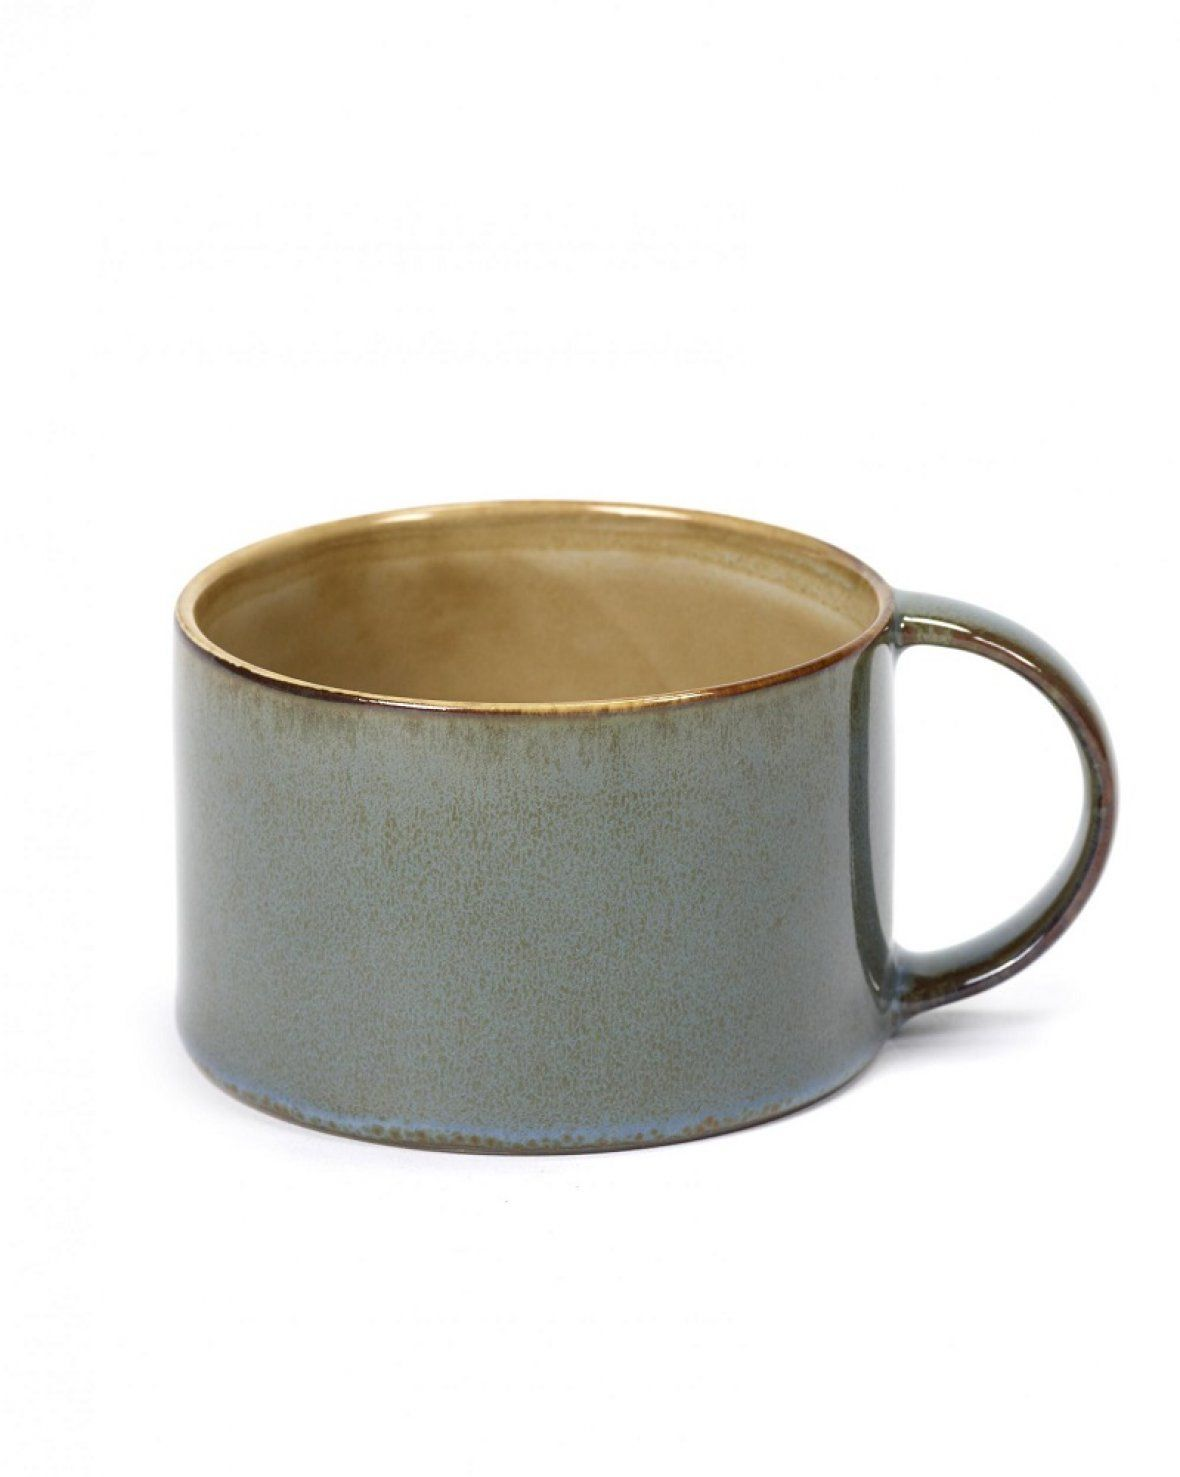 Pin By Janine Poleman On Clay Ceramic Mugs Pottery Mugs